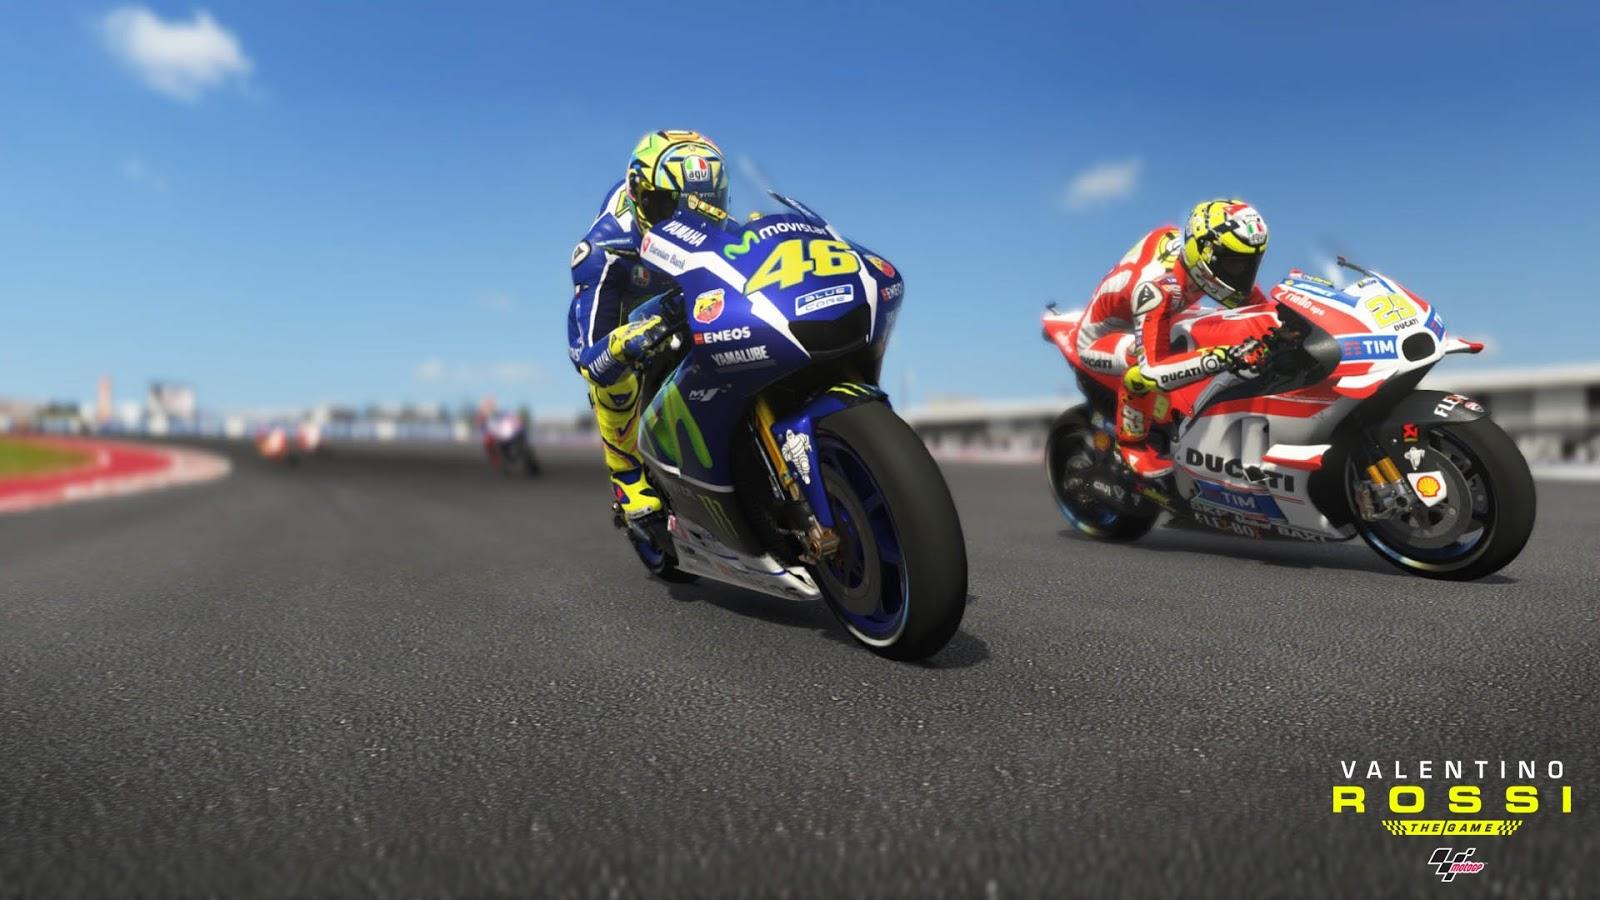 Download Valentino Rossi : The Game Full Crack Codex - Advaster